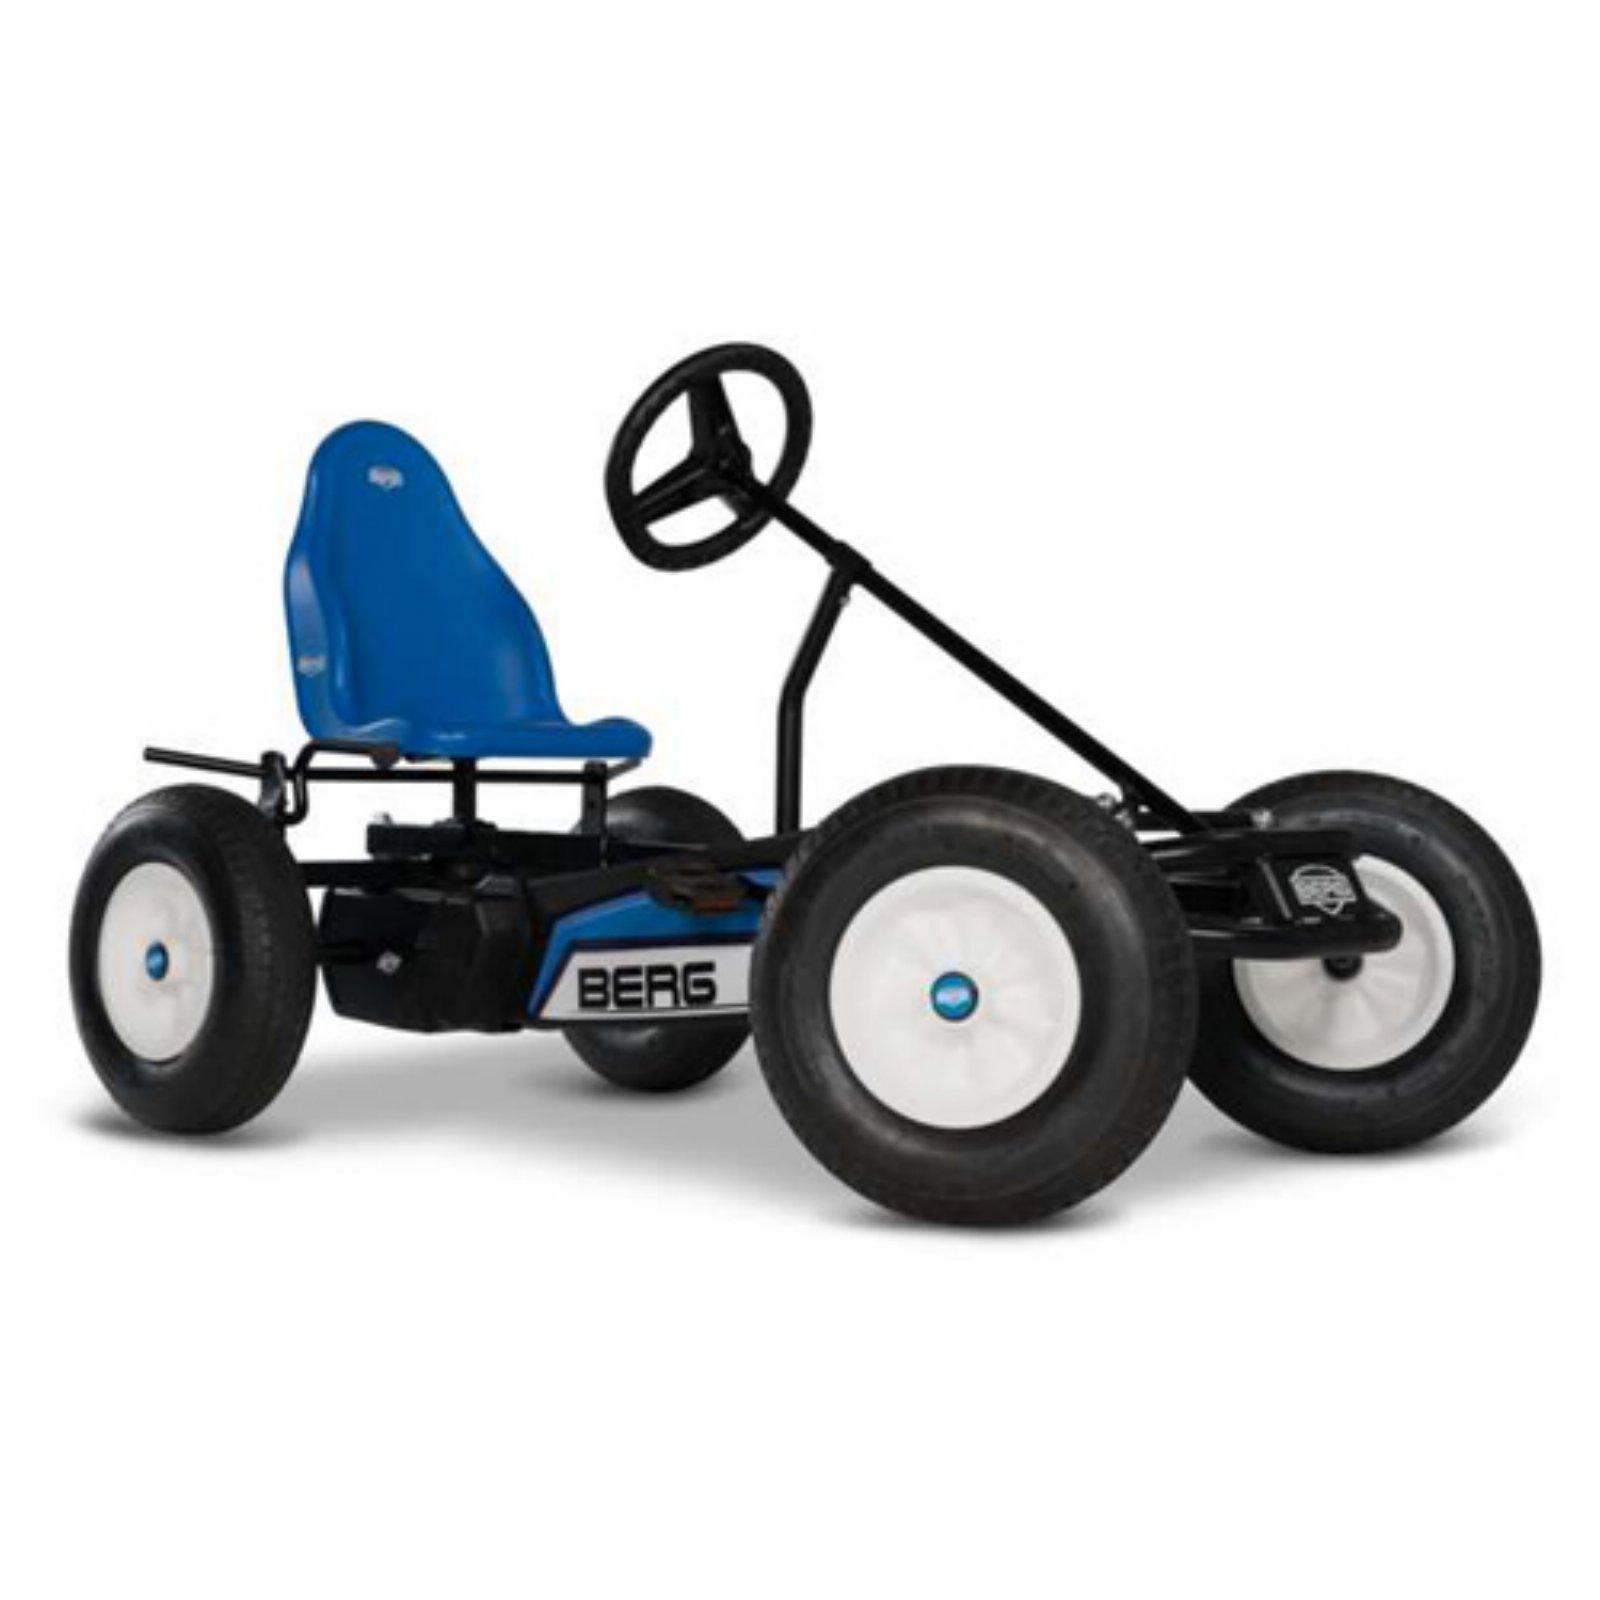 Berg USA Basic BFR Pedal Go Kart Riding Toy by Berg USA